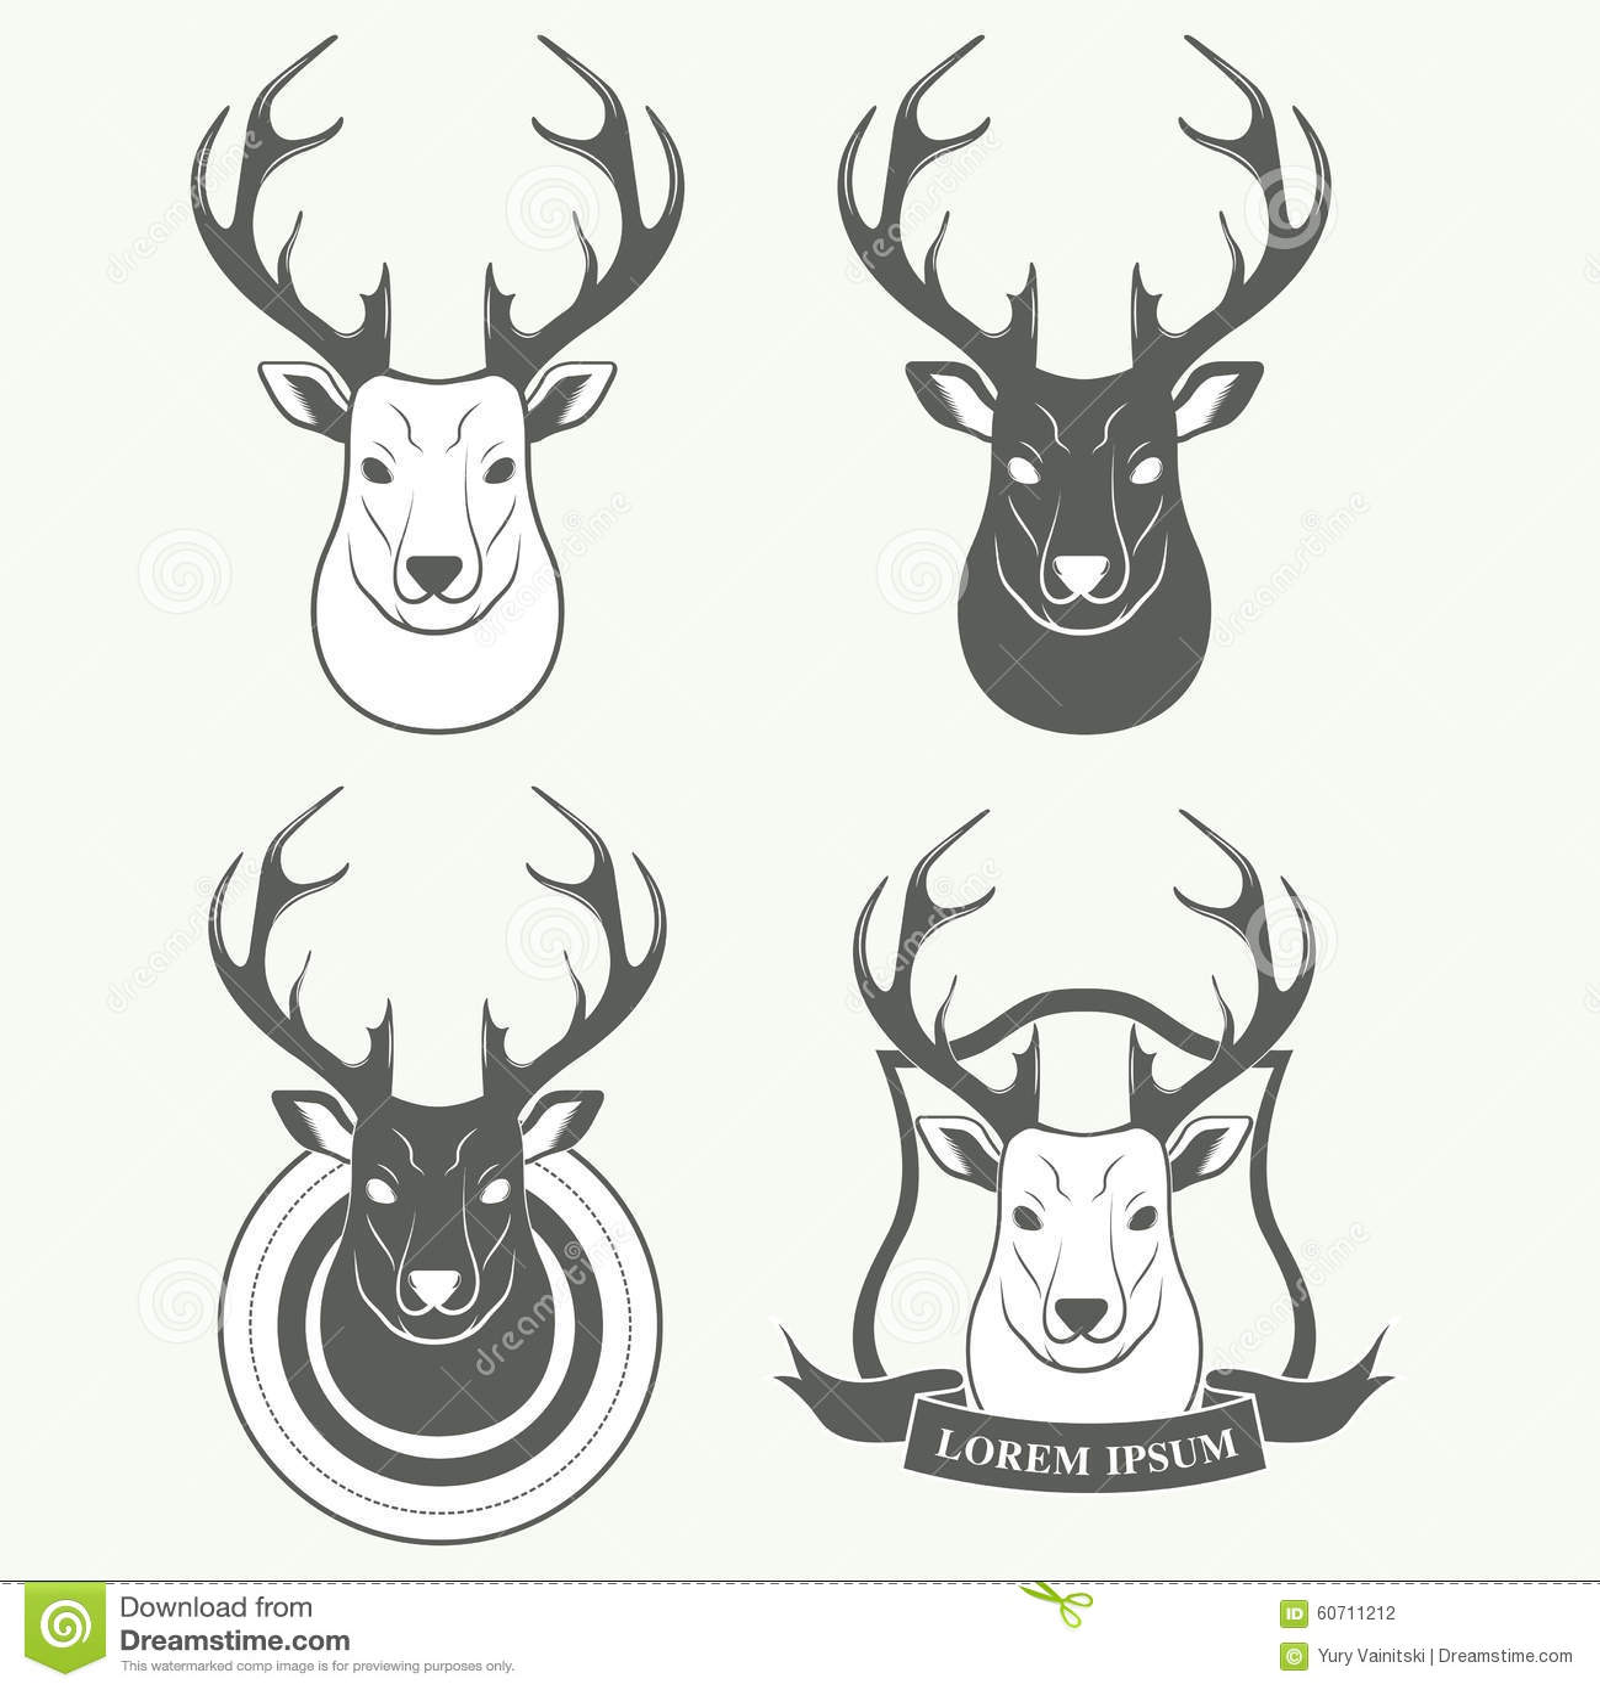 Stock Illustration Moose Deer Reindeer Silhouette Vector furthermore Stock Illustration Deer Head Isolated White Background Silhouette Standing Vector Logo Illustration Image60711212 moreover Deer Skull Tattoos further Fc9bd028115ad5b4 moreover Deer 20clipart 20easy 20draw. on deer antlers sketch